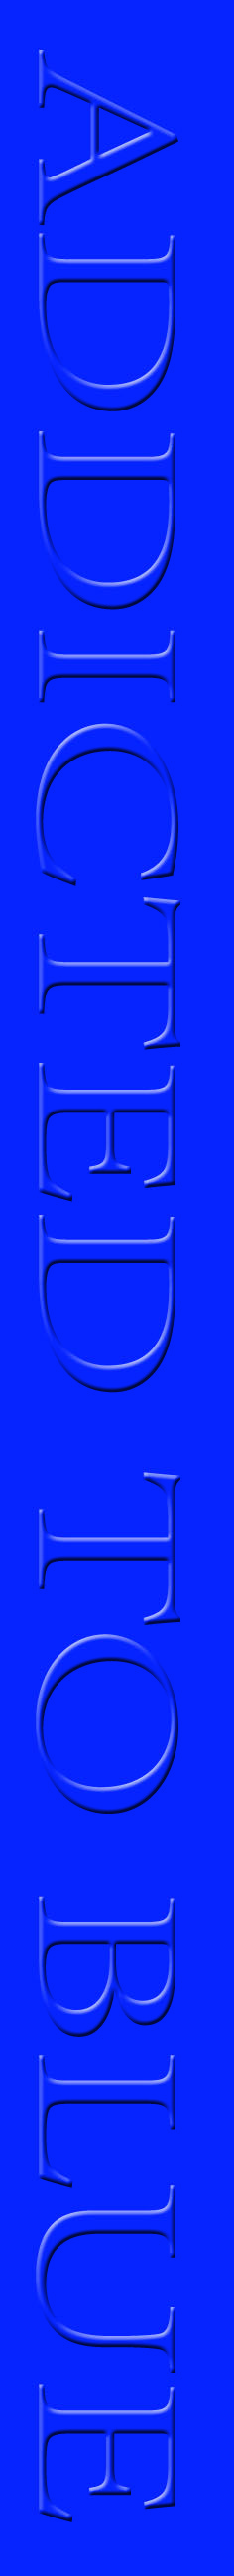 blue.quenalbertini: All in Blue